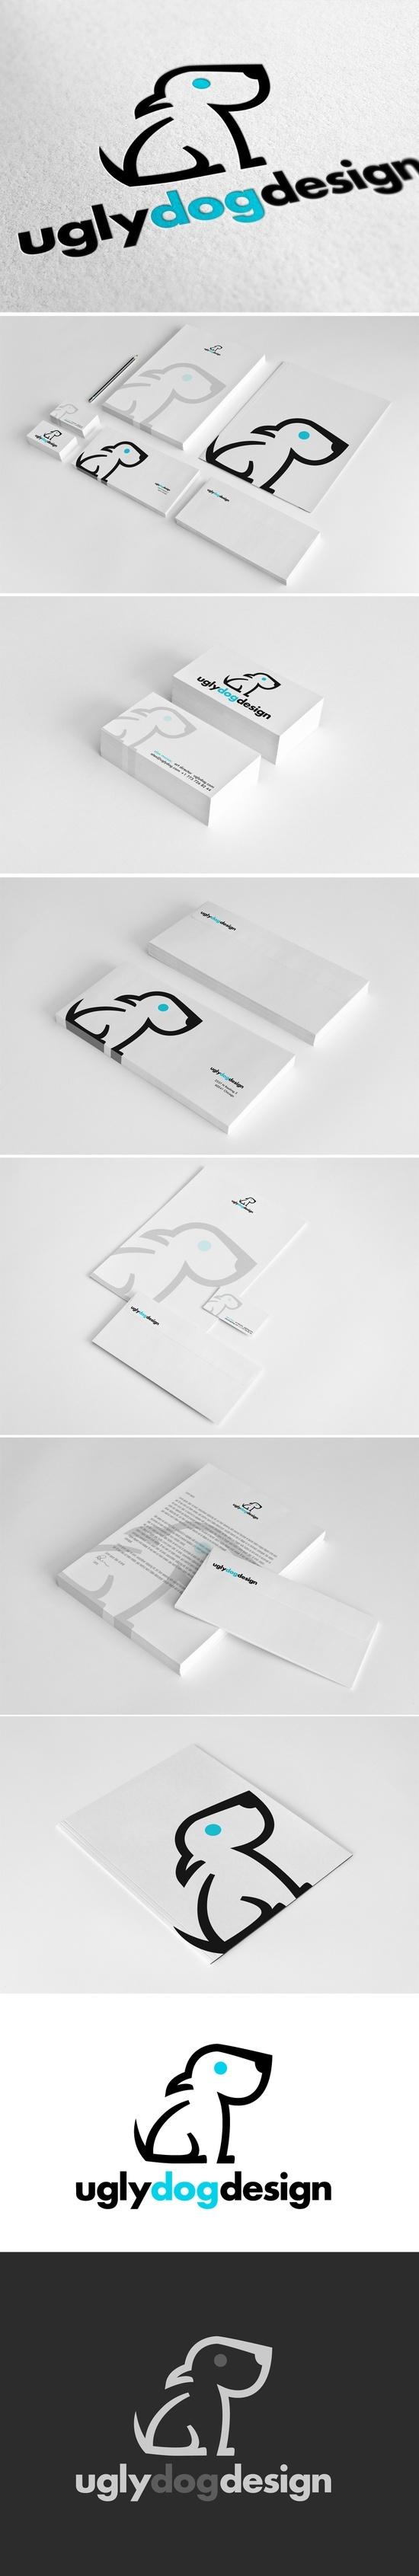 Ugly Dog Design / rebranding by nastek | - www.BlickeDeeler.de |...